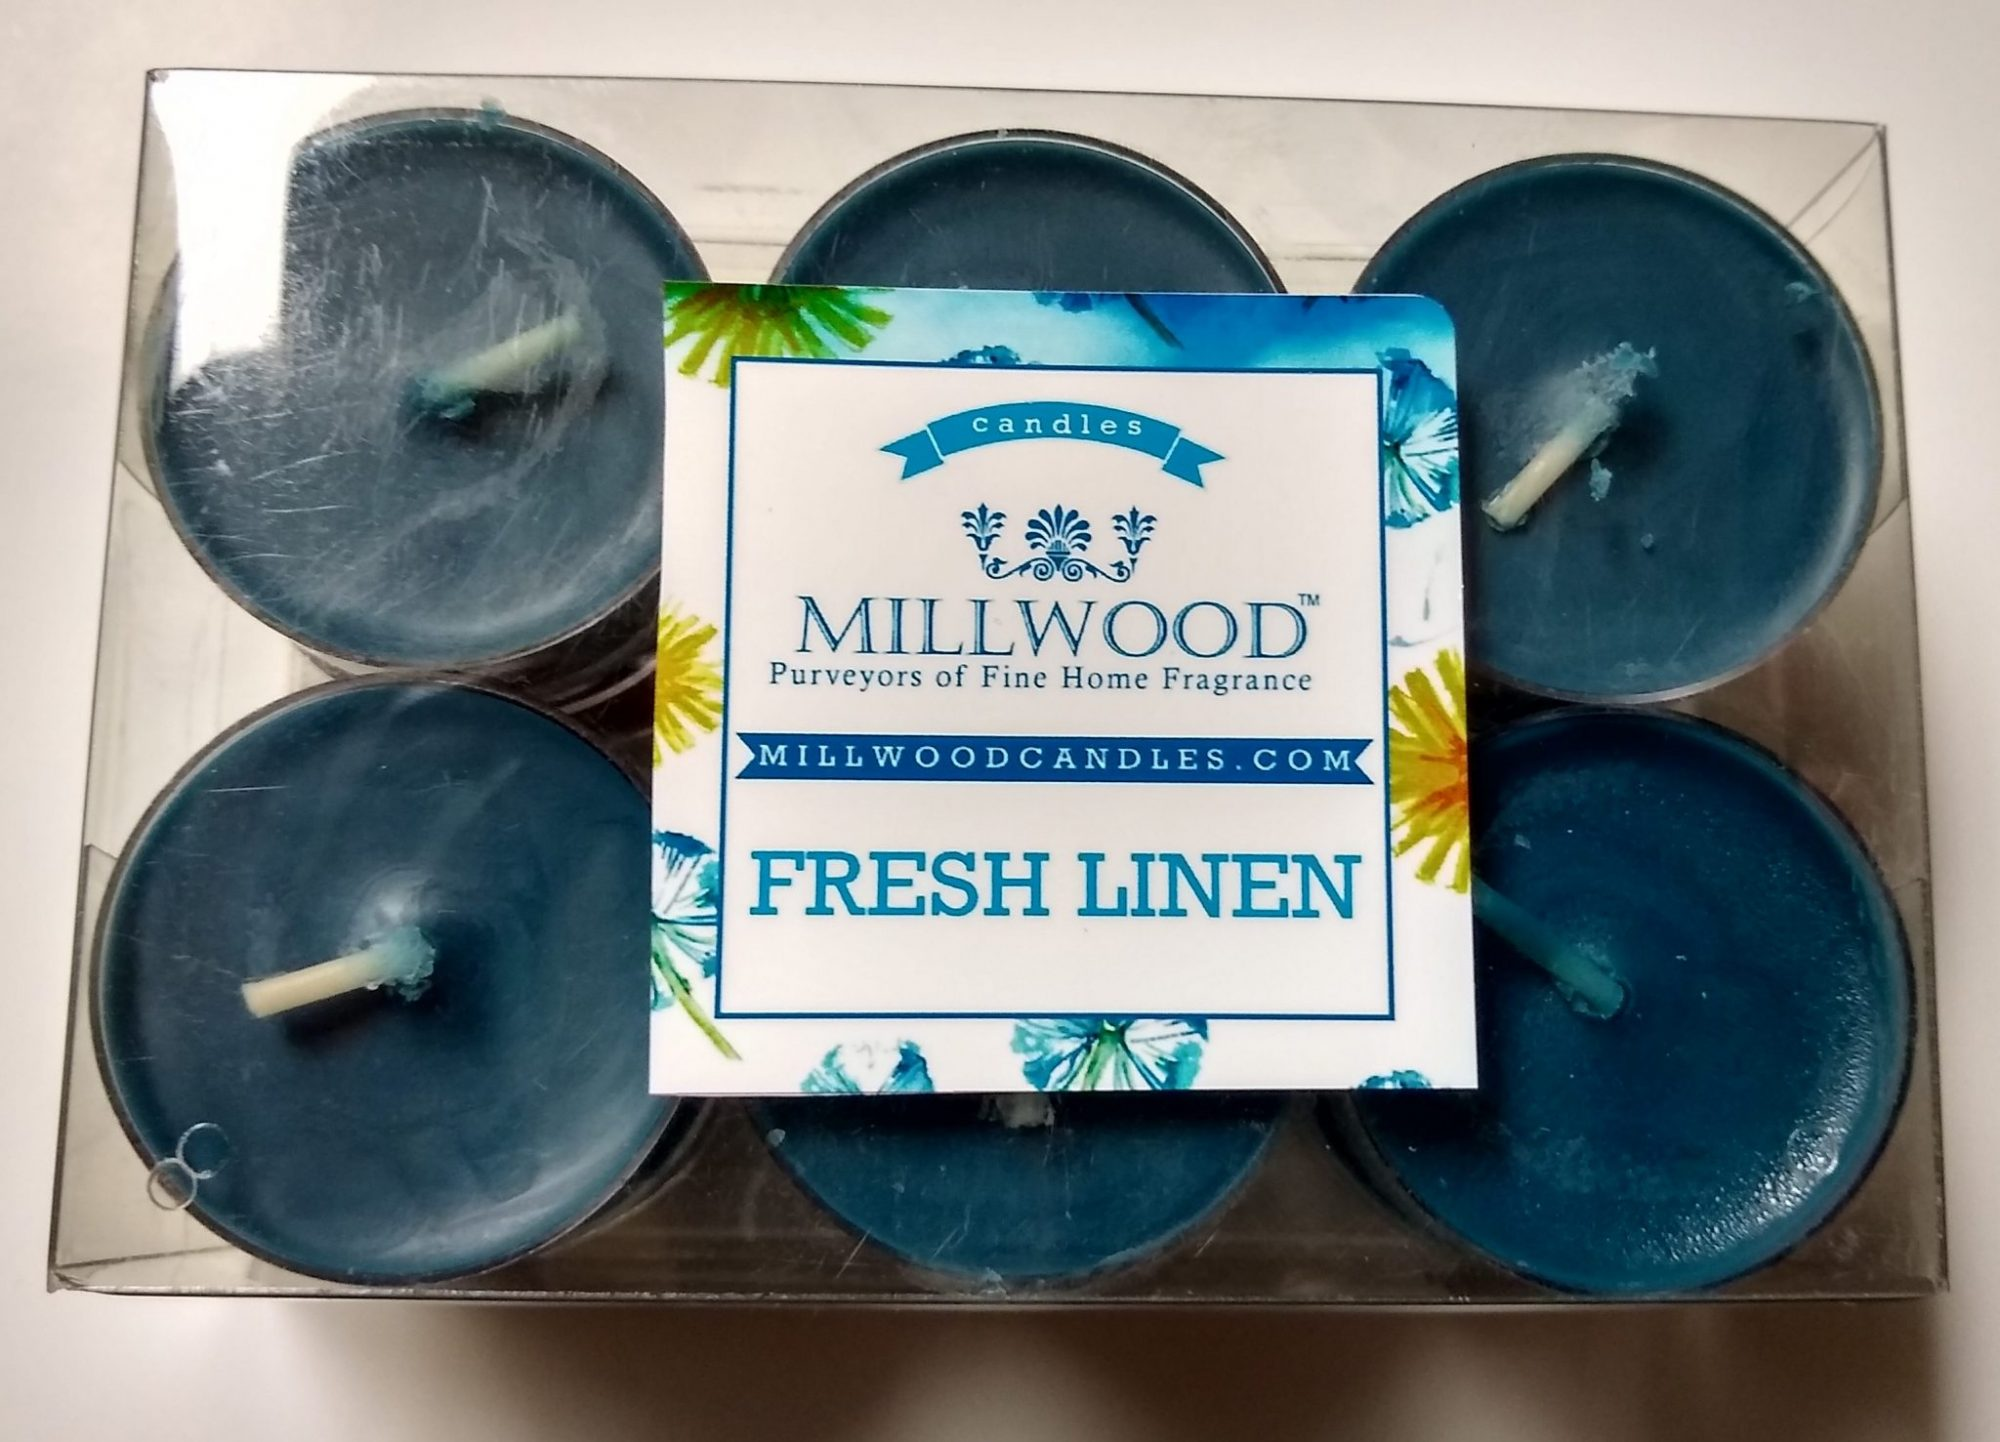 12 pack Millwood Candles Freah Linen tealights